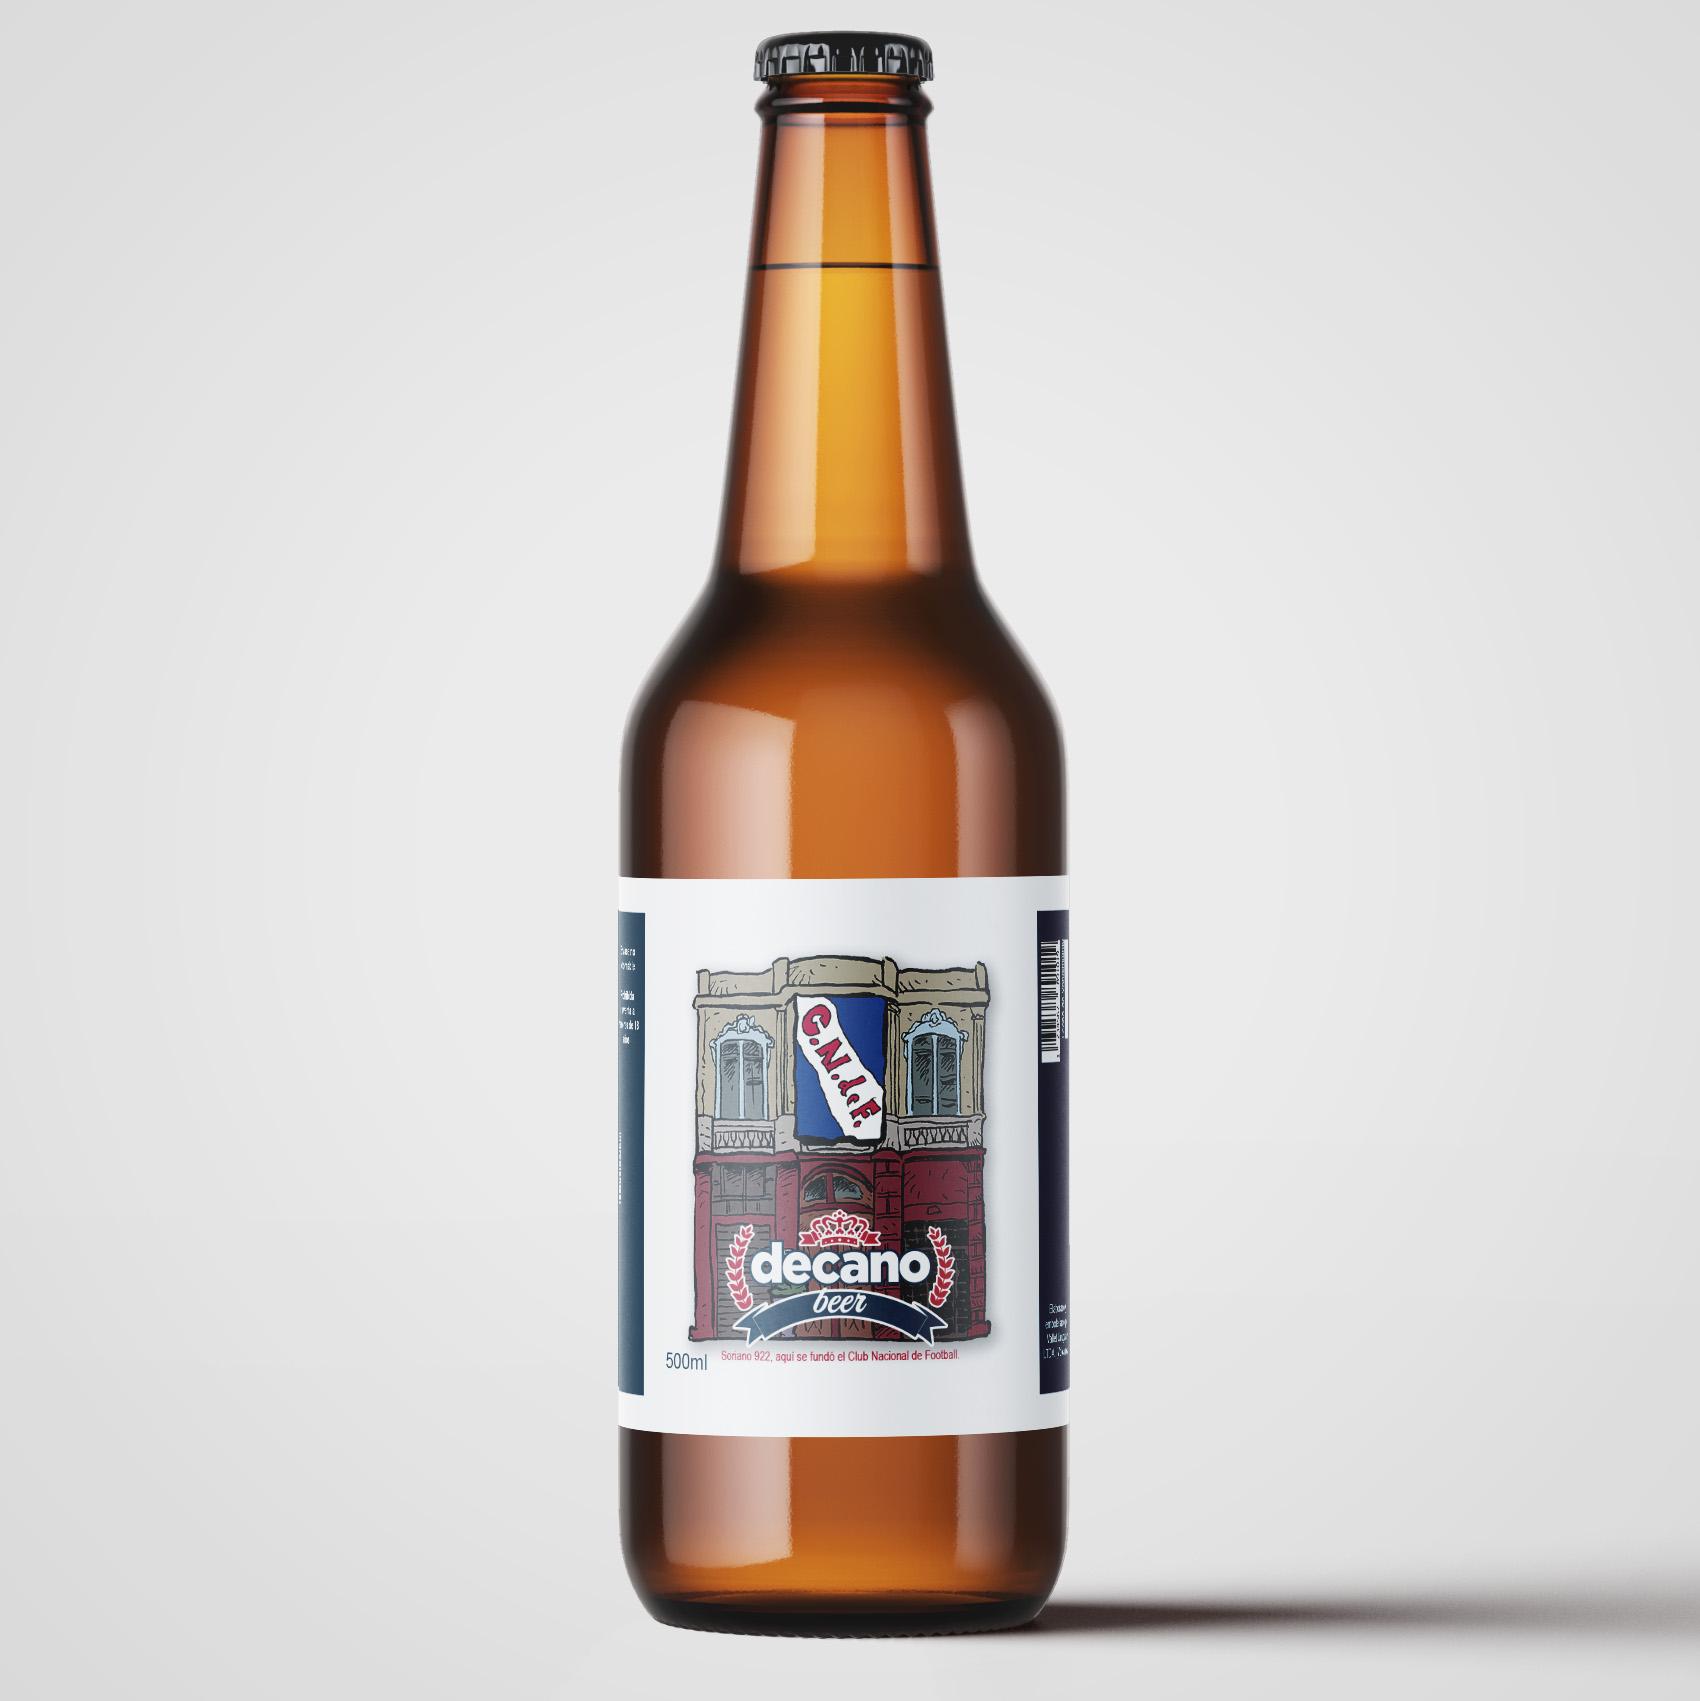 Decano Beer Label Sample